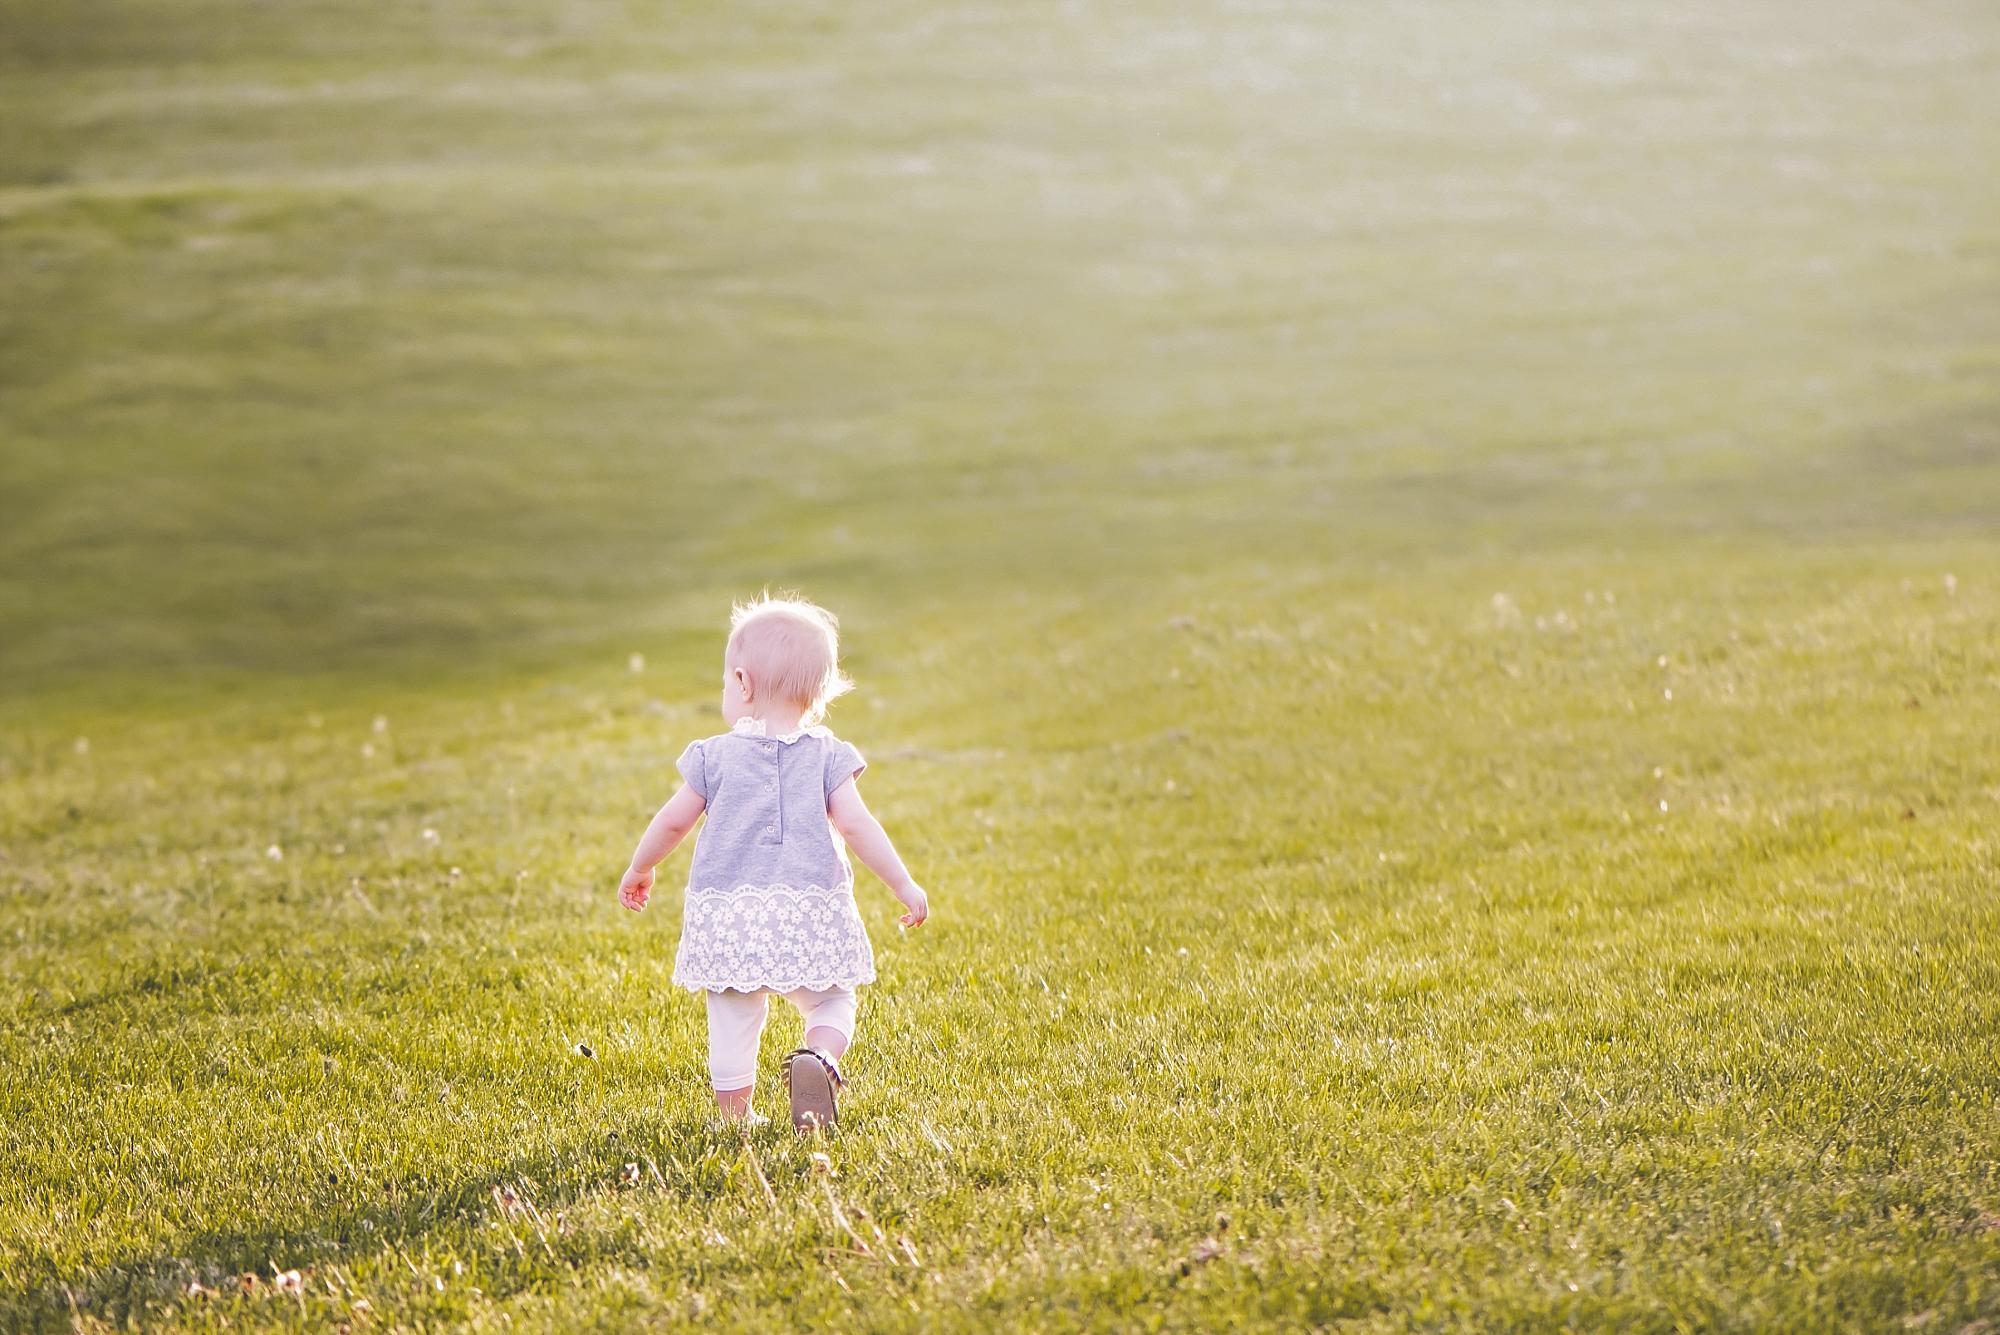 Toddler girl walking away in a field